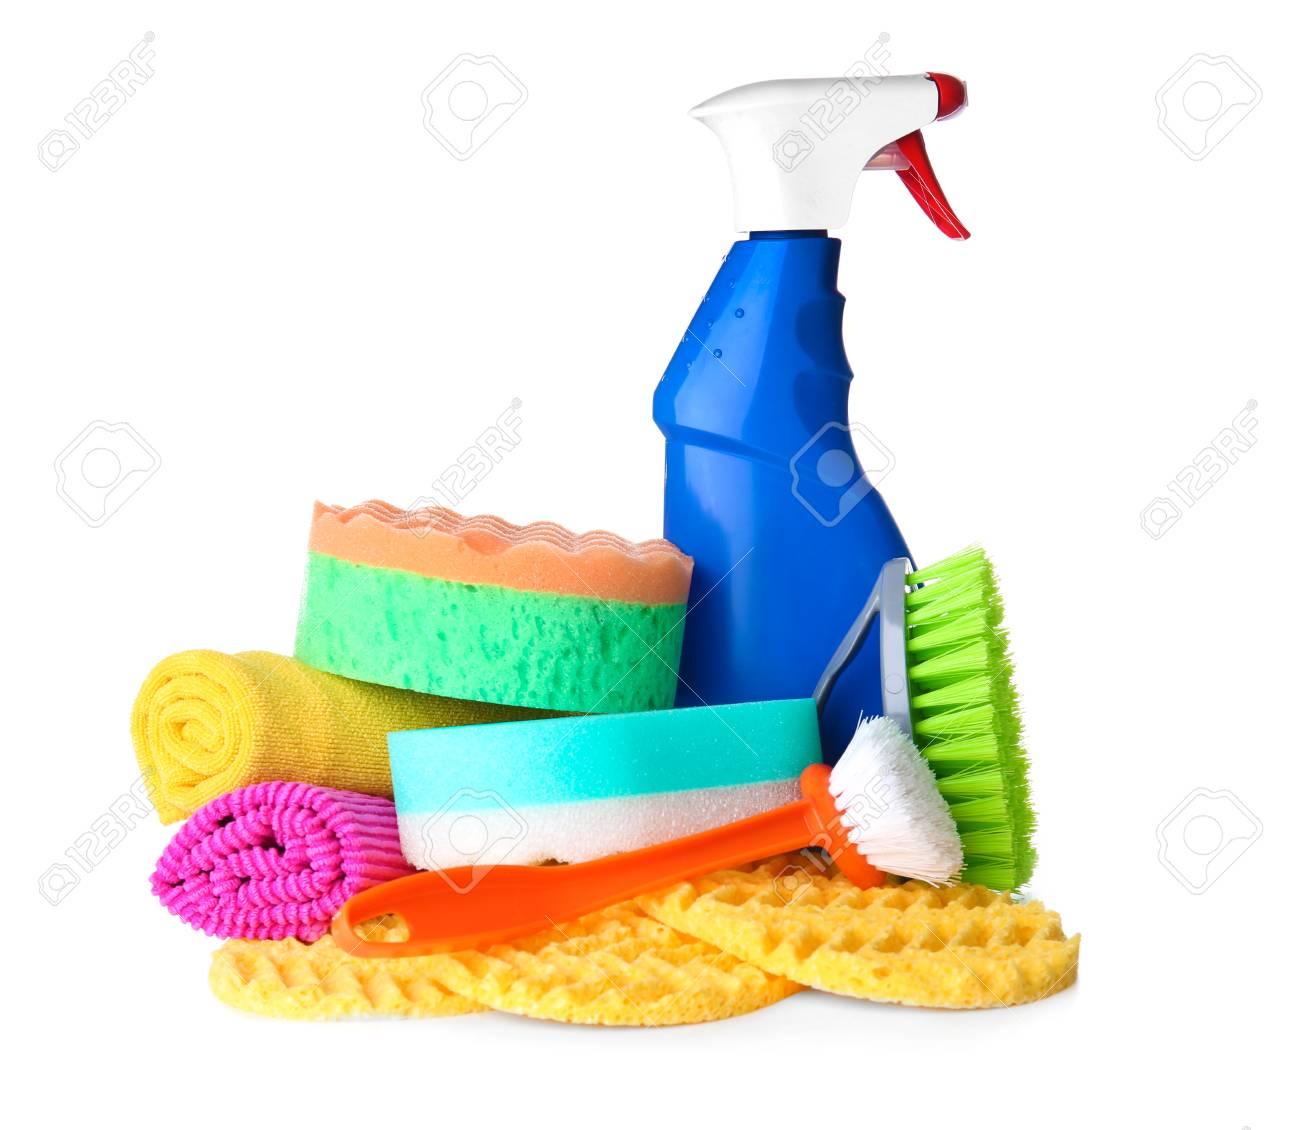 Car Cleaning Supplies >> Car Cleaning Supplies On White Background